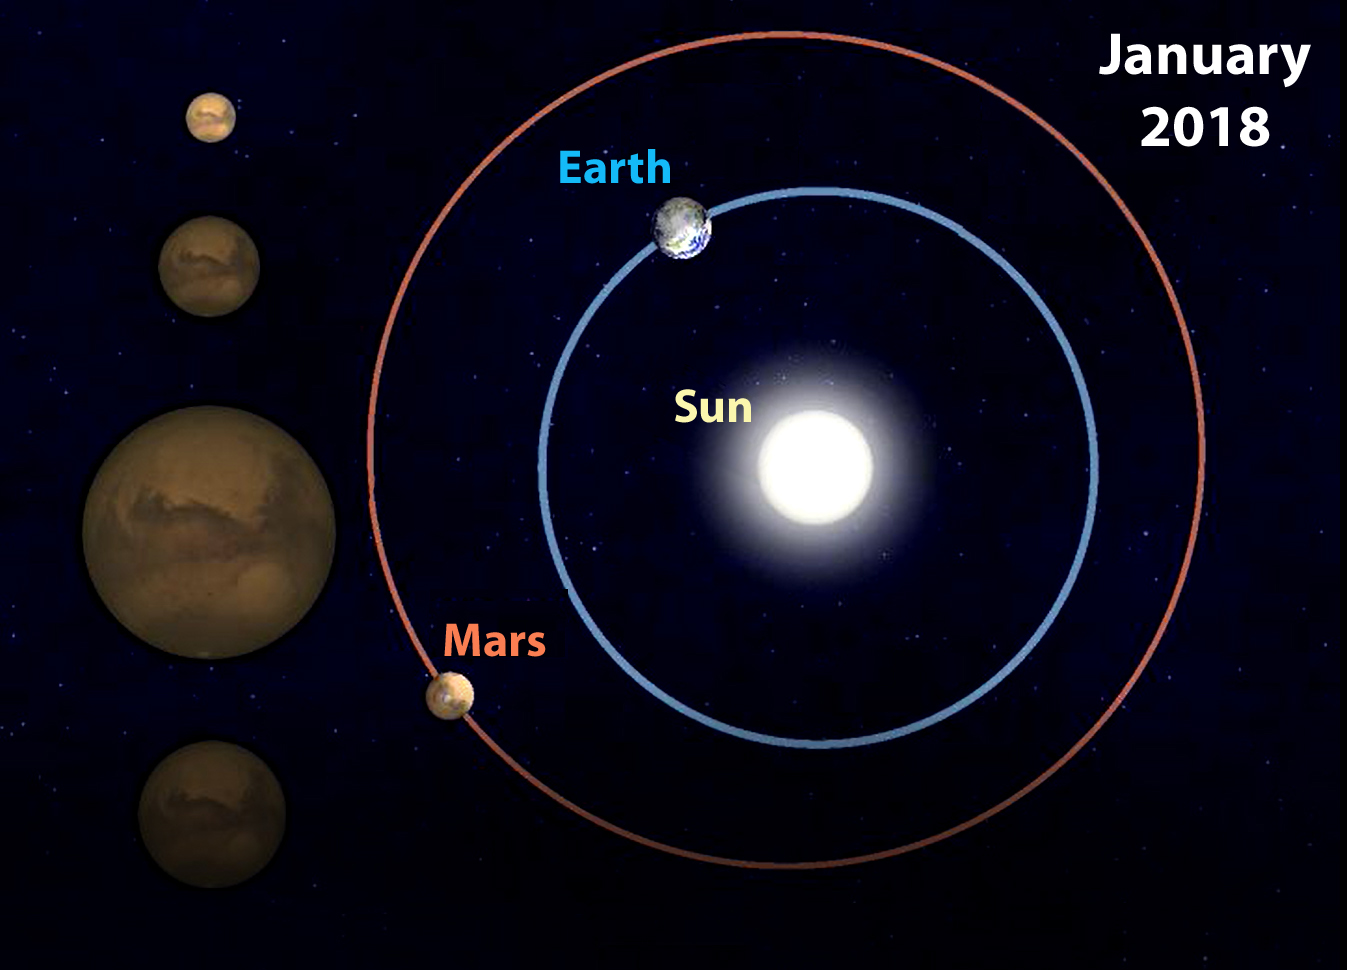 Mars-Earth in January 2018